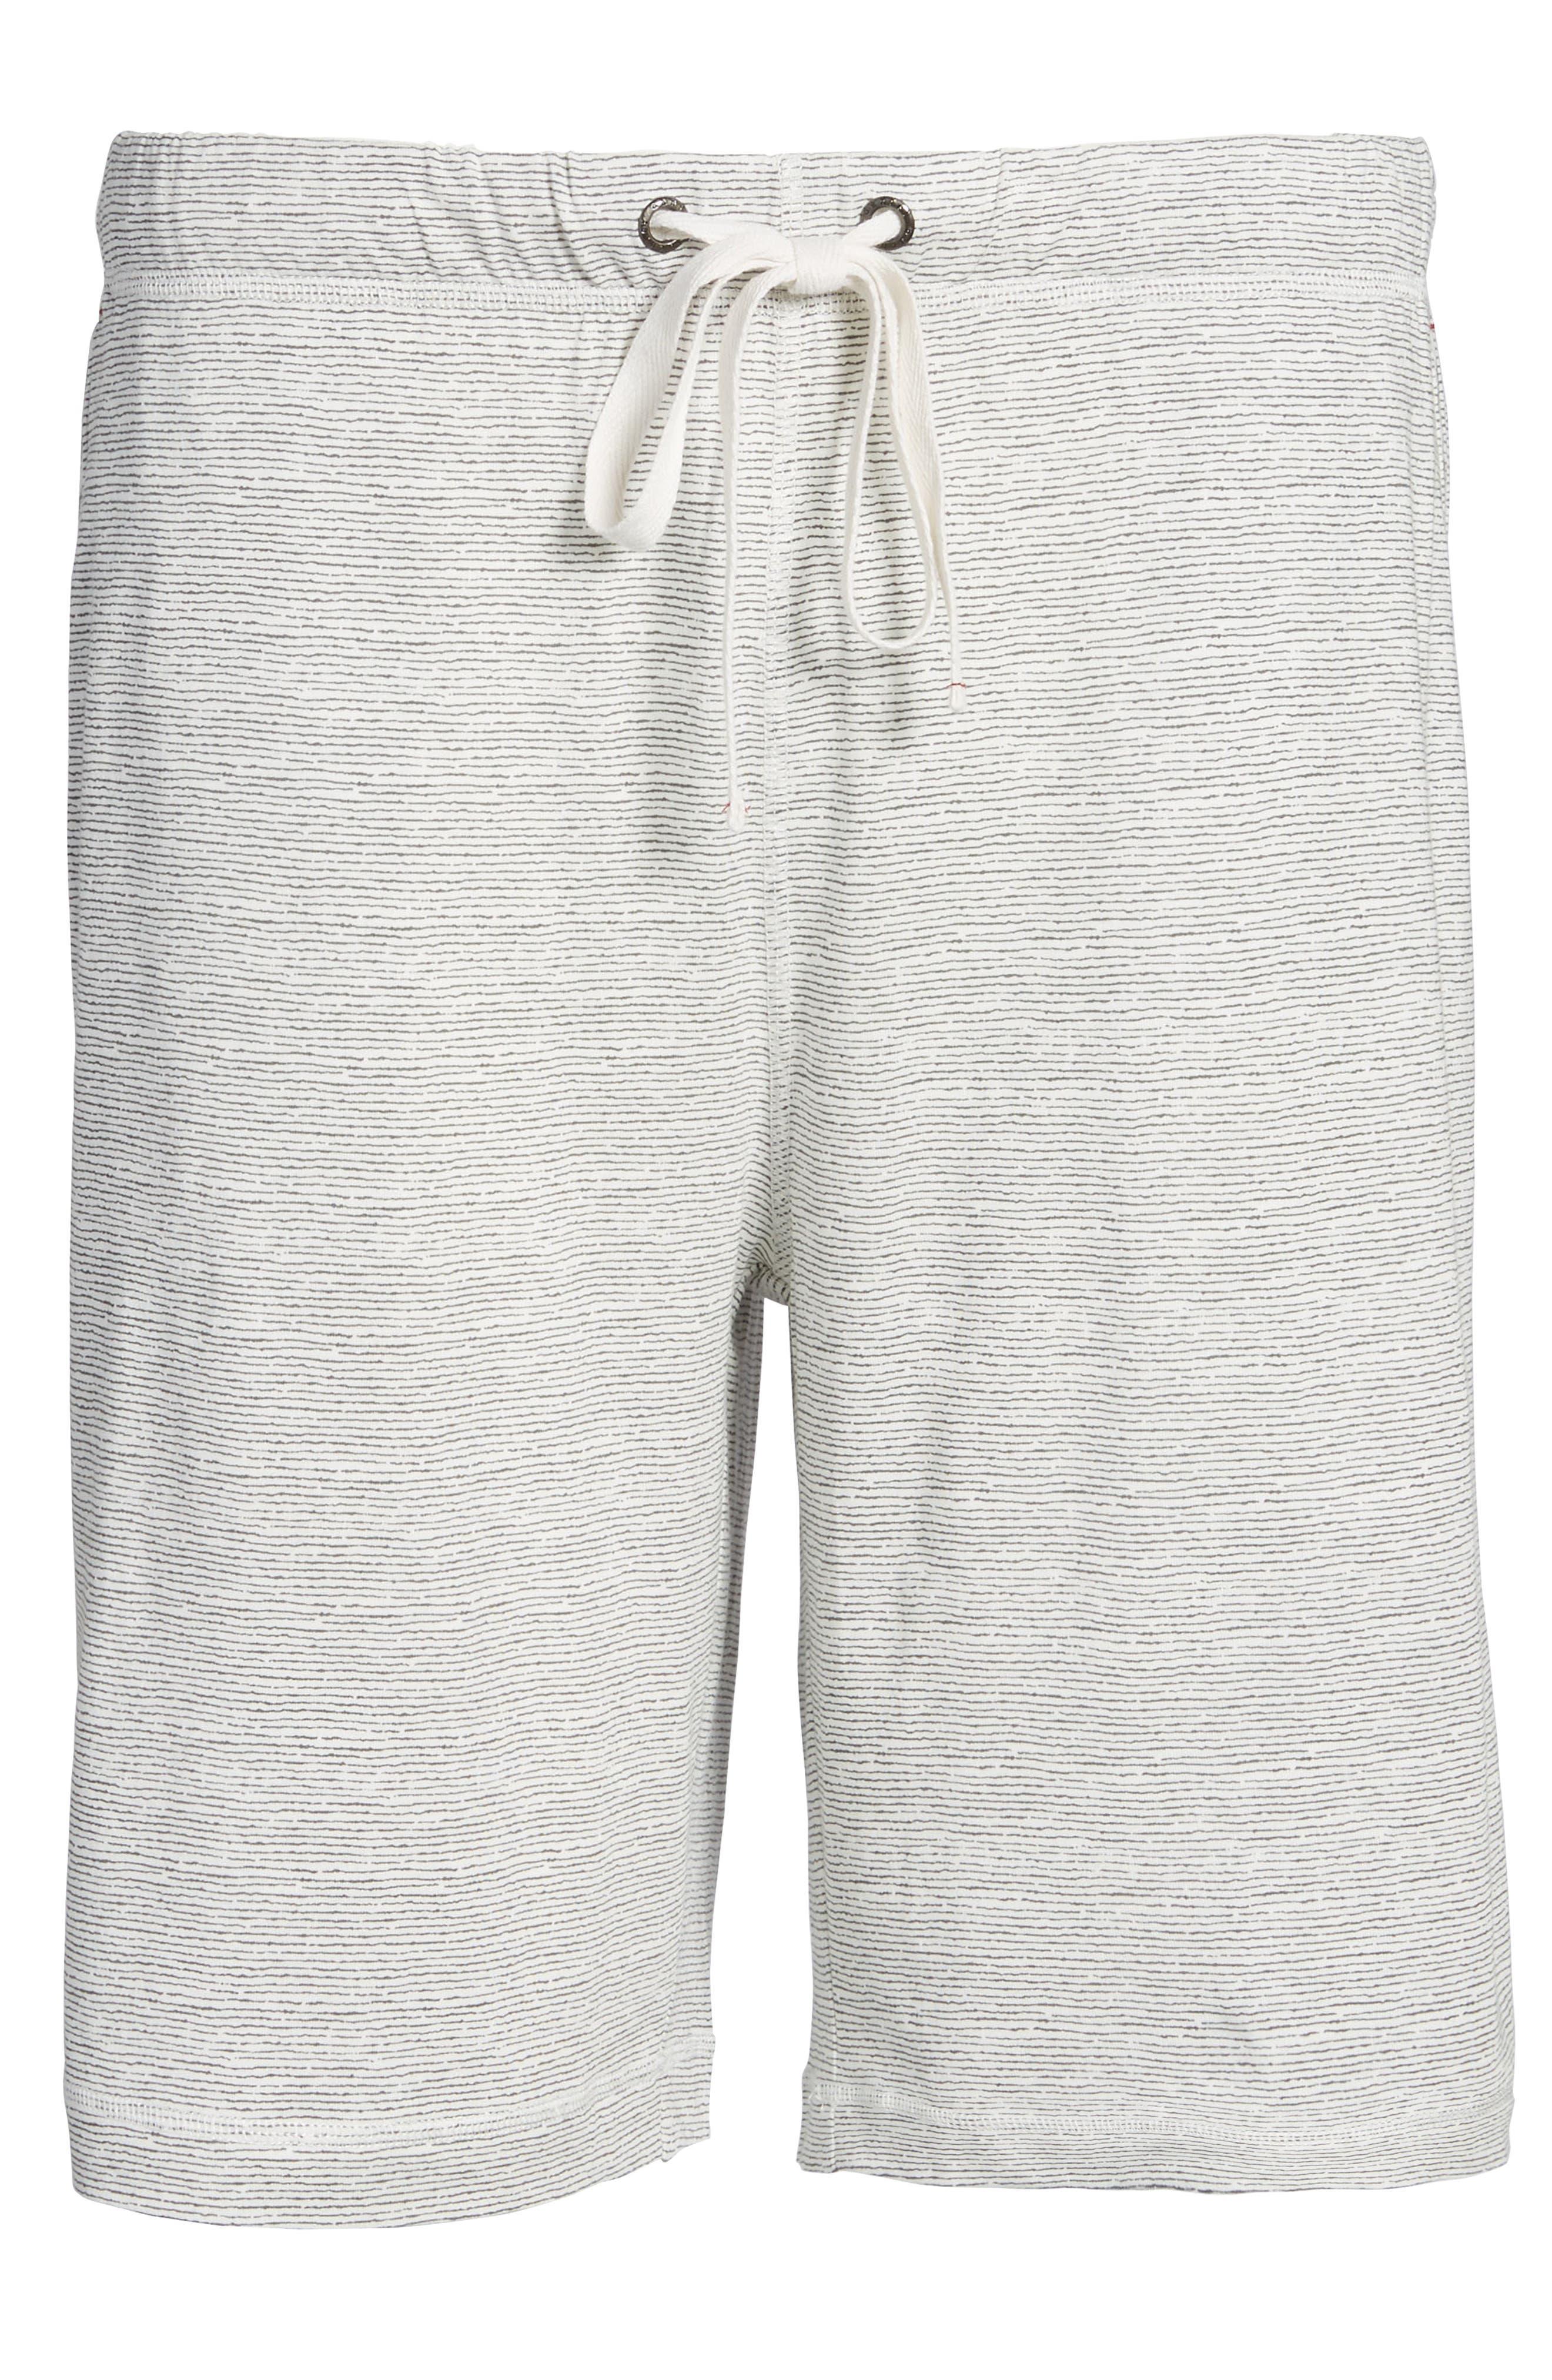 Feeder Stripe Pima Cotton & Modal Lounge Shorts,                             Alternate thumbnail 6, color,                             020